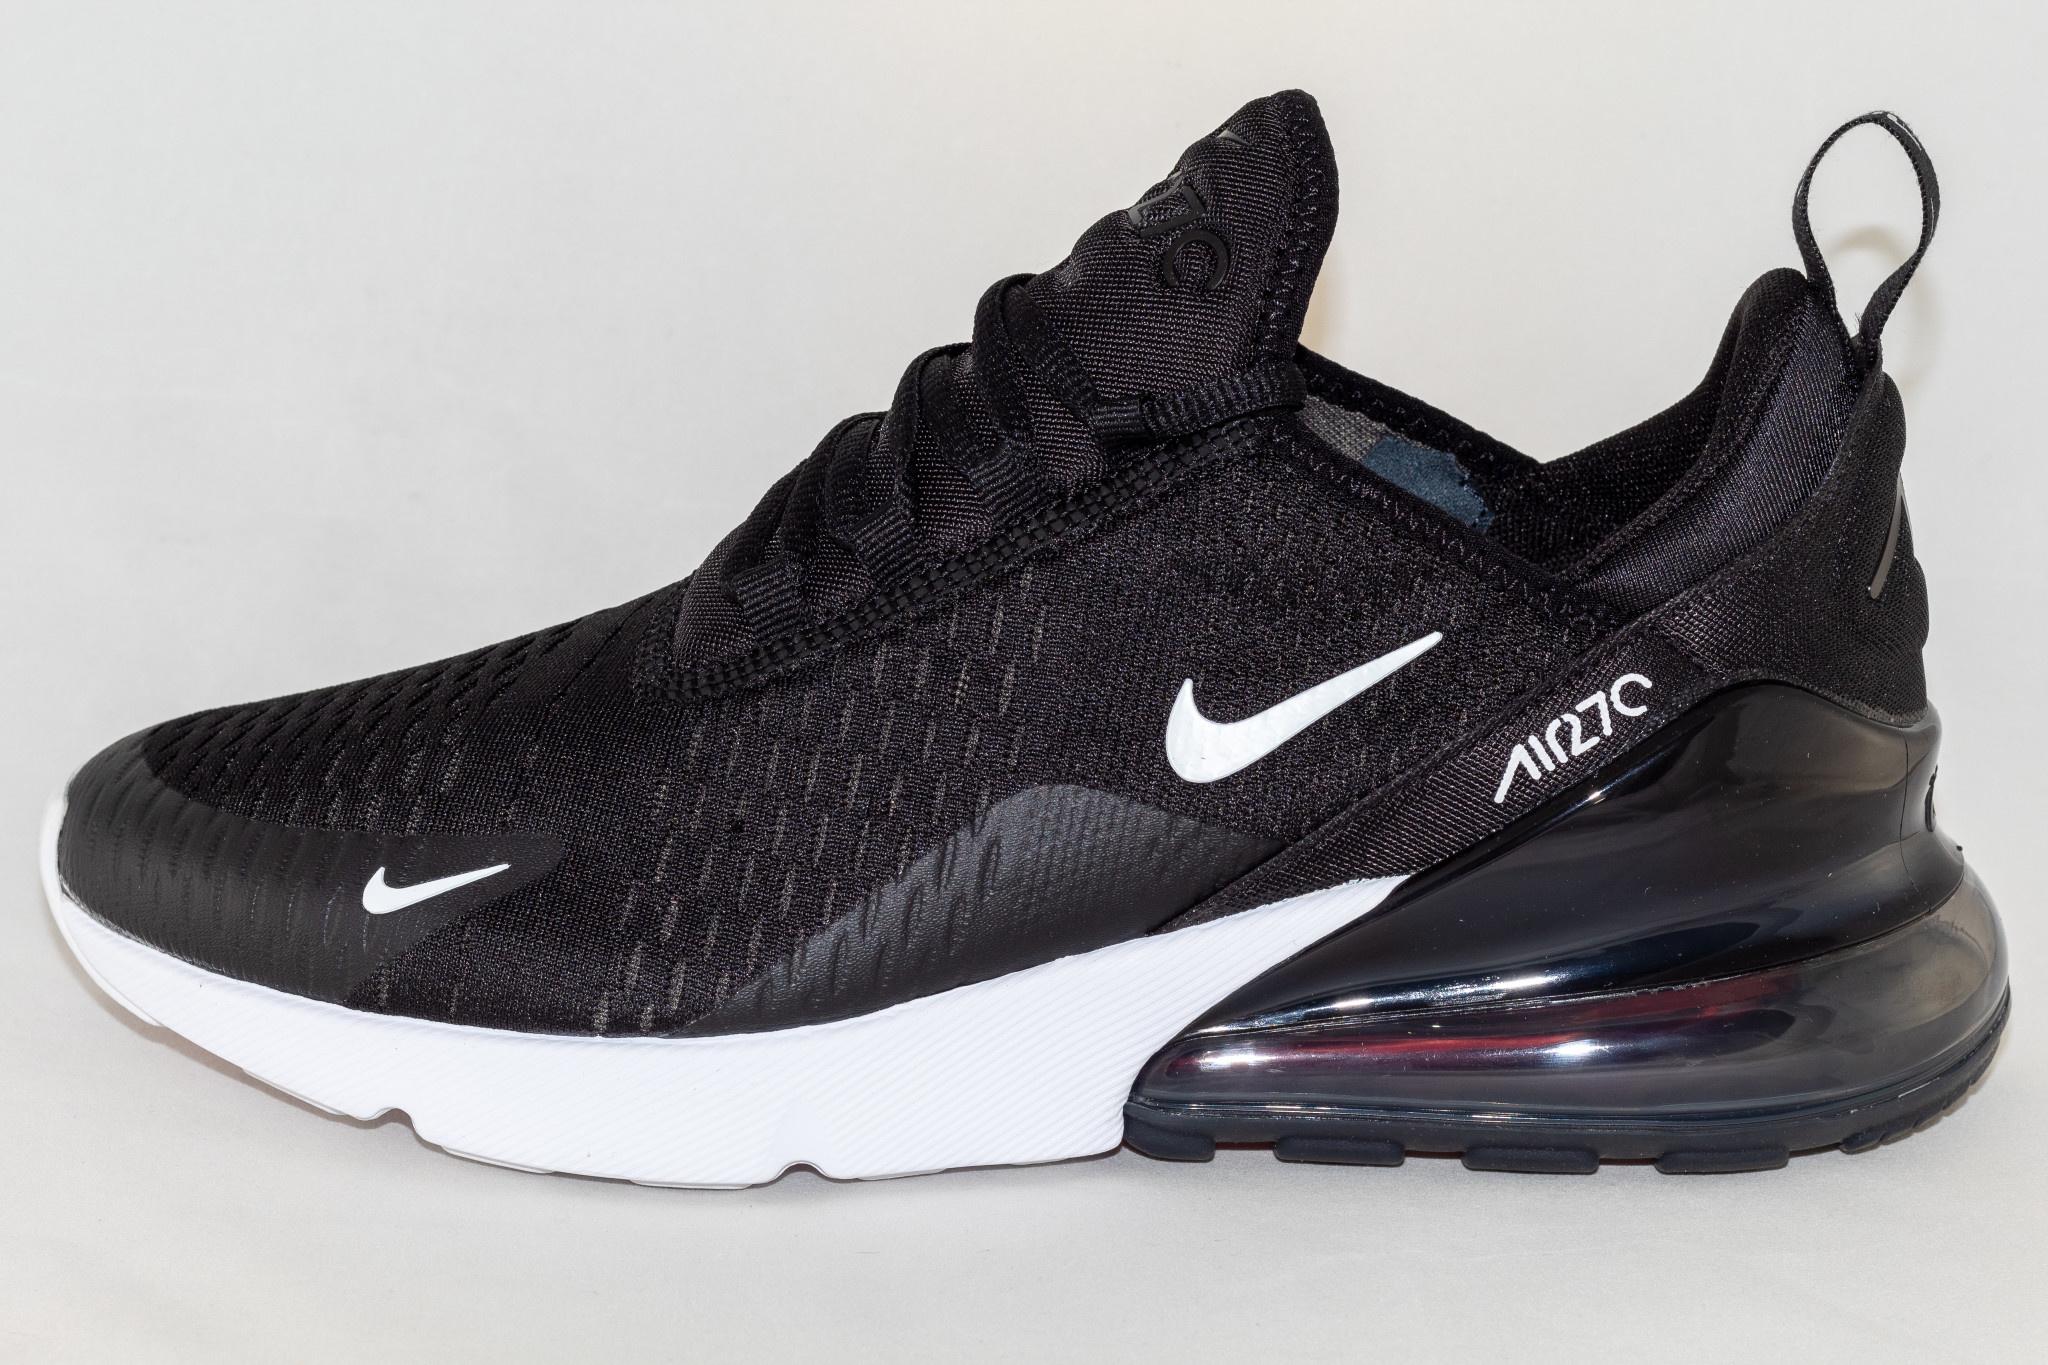 Nike Nike Air Max 270 Black/ Anthracite-White